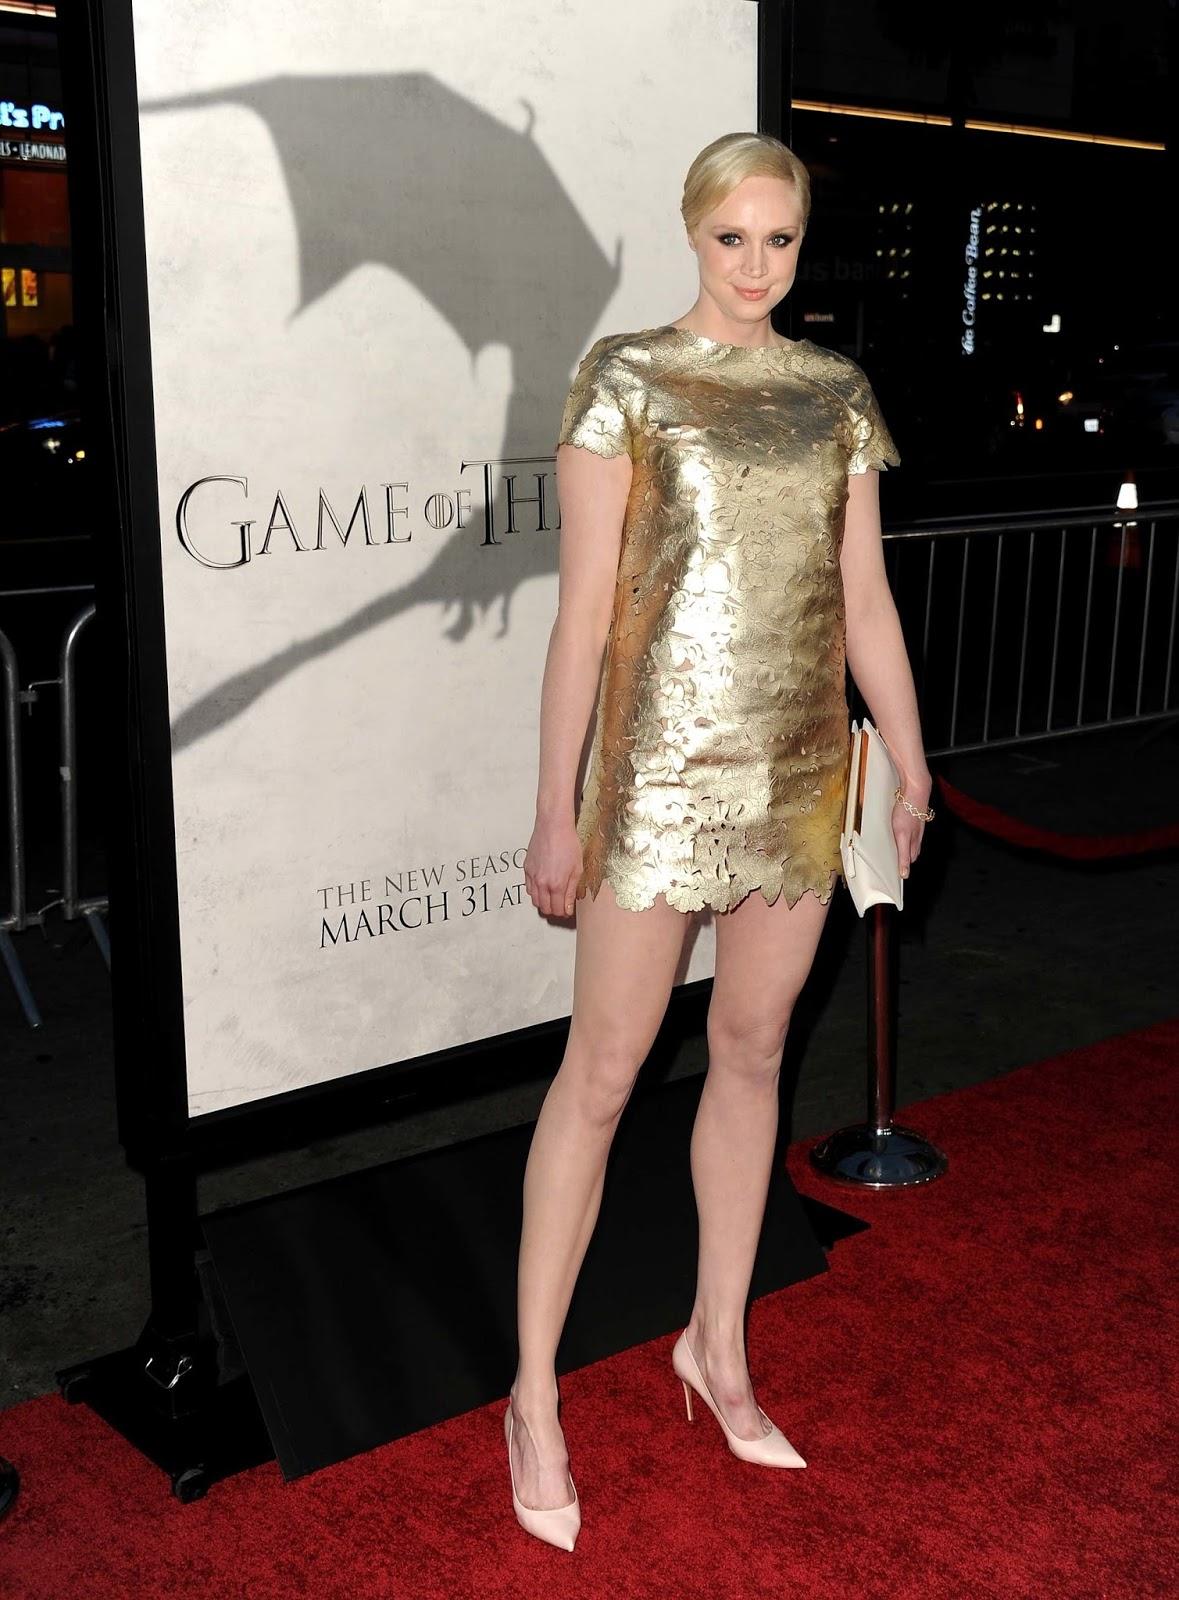 Gwendoline Christie Nude Pictures inside rimbaud: game of thrones / gwendoline christie